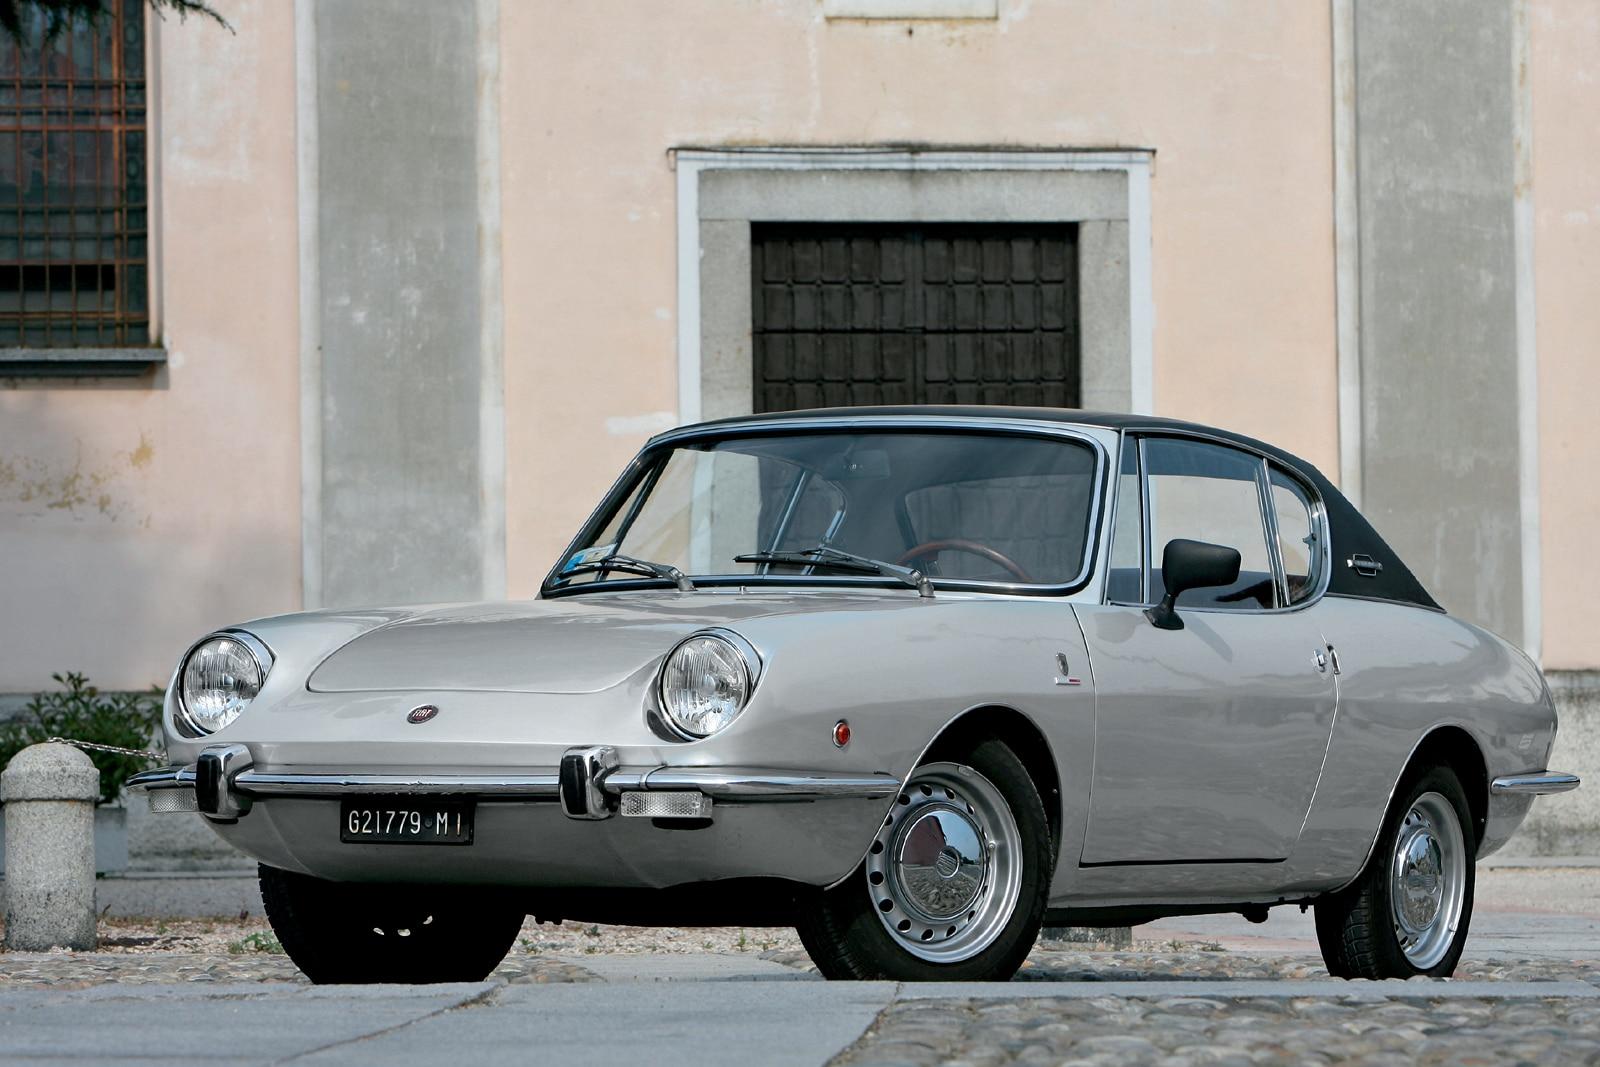 GIUNTO RUOTA PIRELLI FIAT 850 I SERIE SPECIAL SPORT SUPER VIGNALE BERLINA